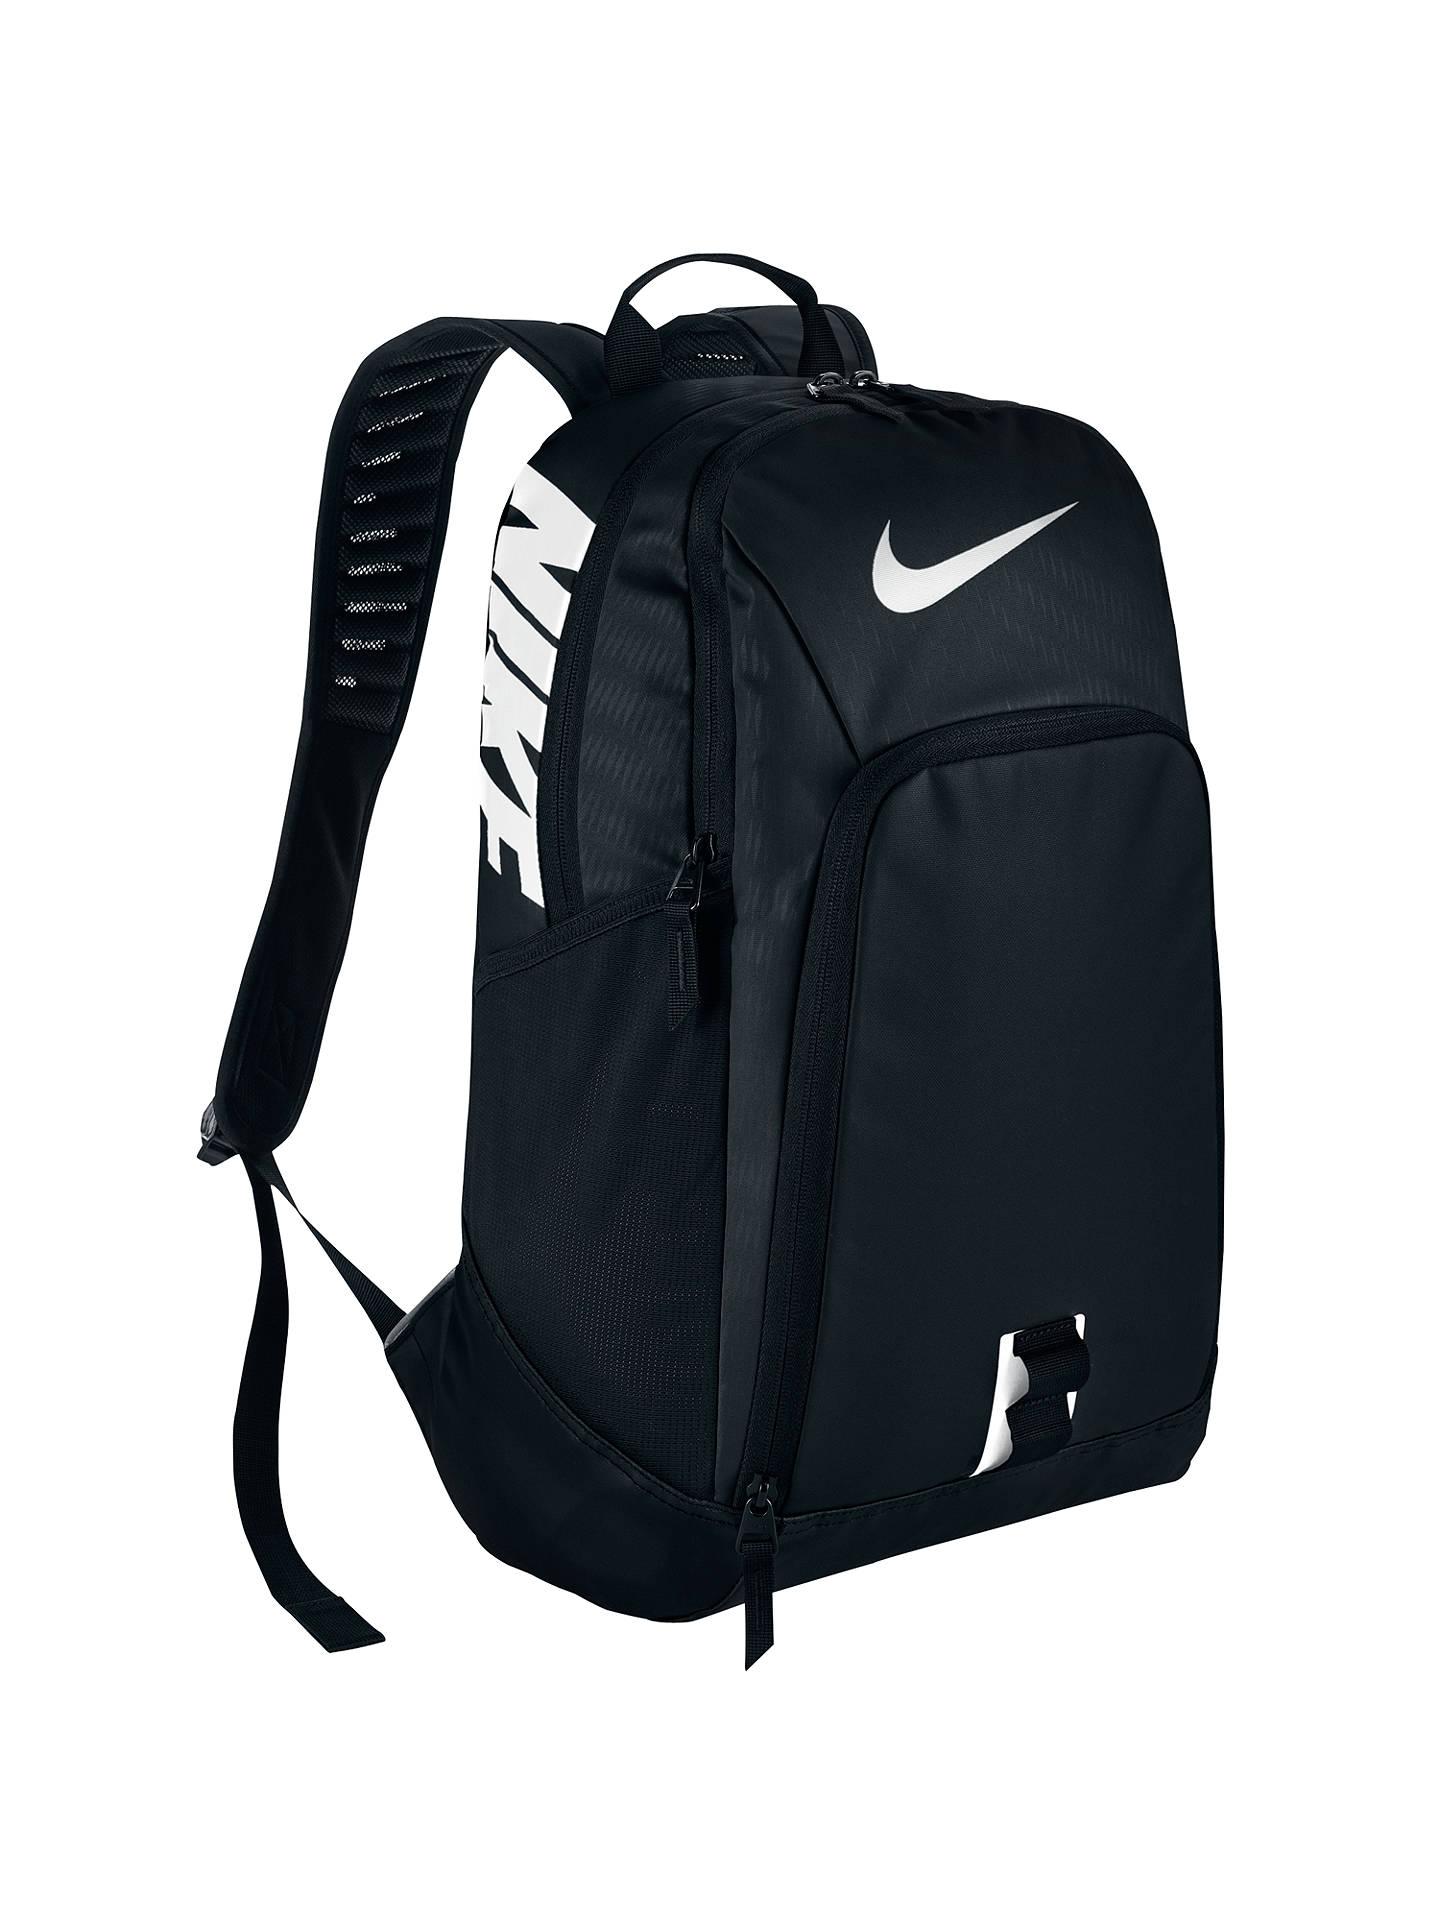 BuyNike Alpha Adapt Rev Backpack b8de6098bd219